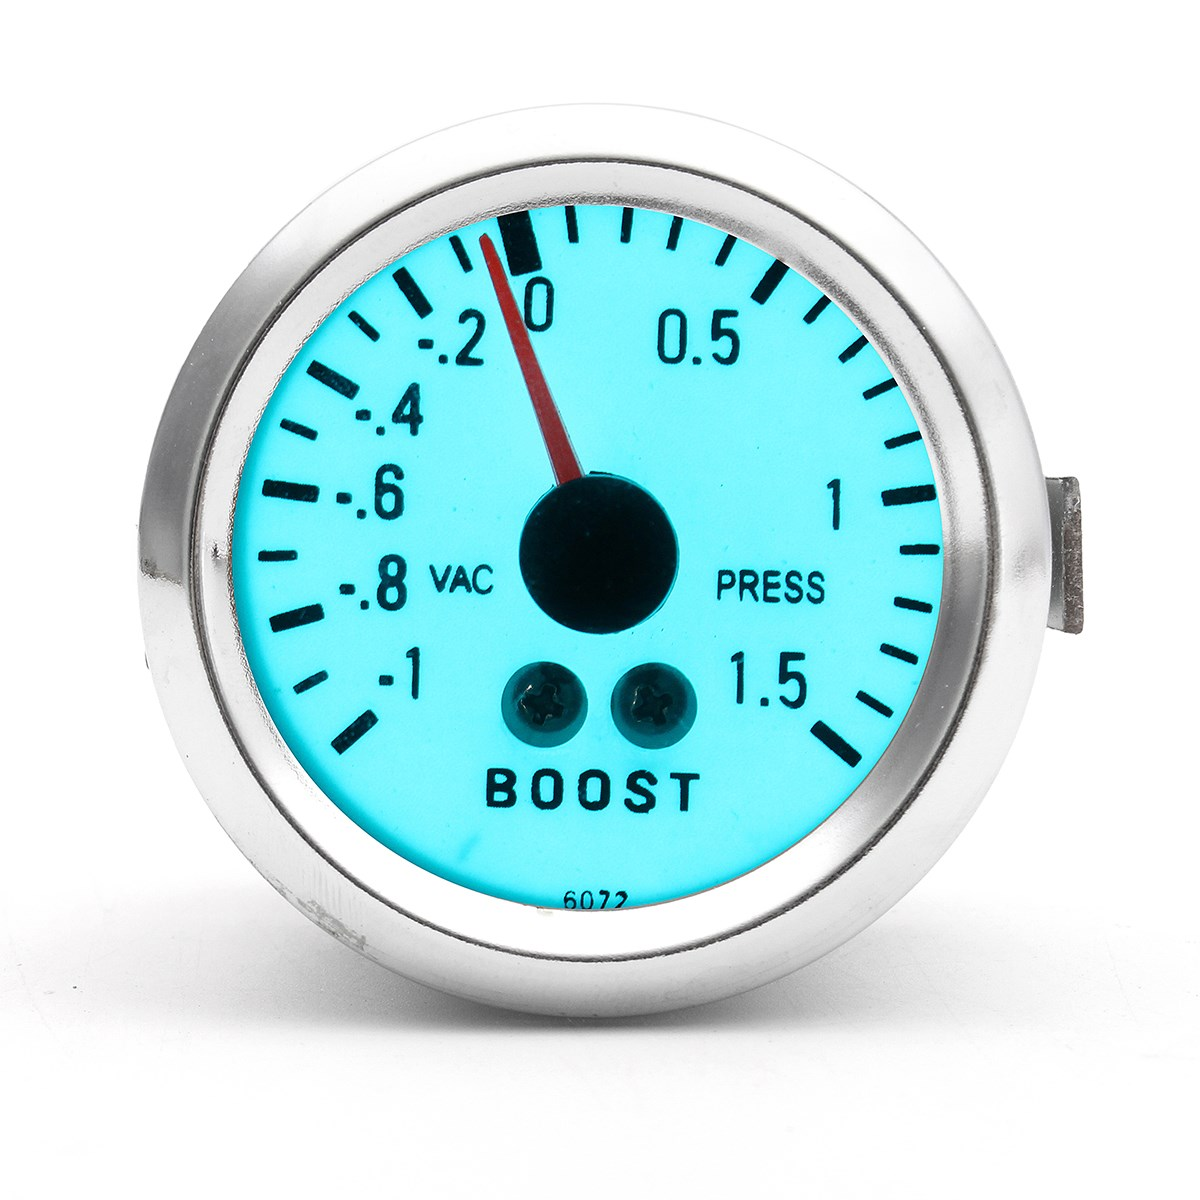 fontb2-b-font-inch-52mm-boost-gauge-chrome-rim-electro-mechanical-luminescent-automobile-fontb0-b-fo